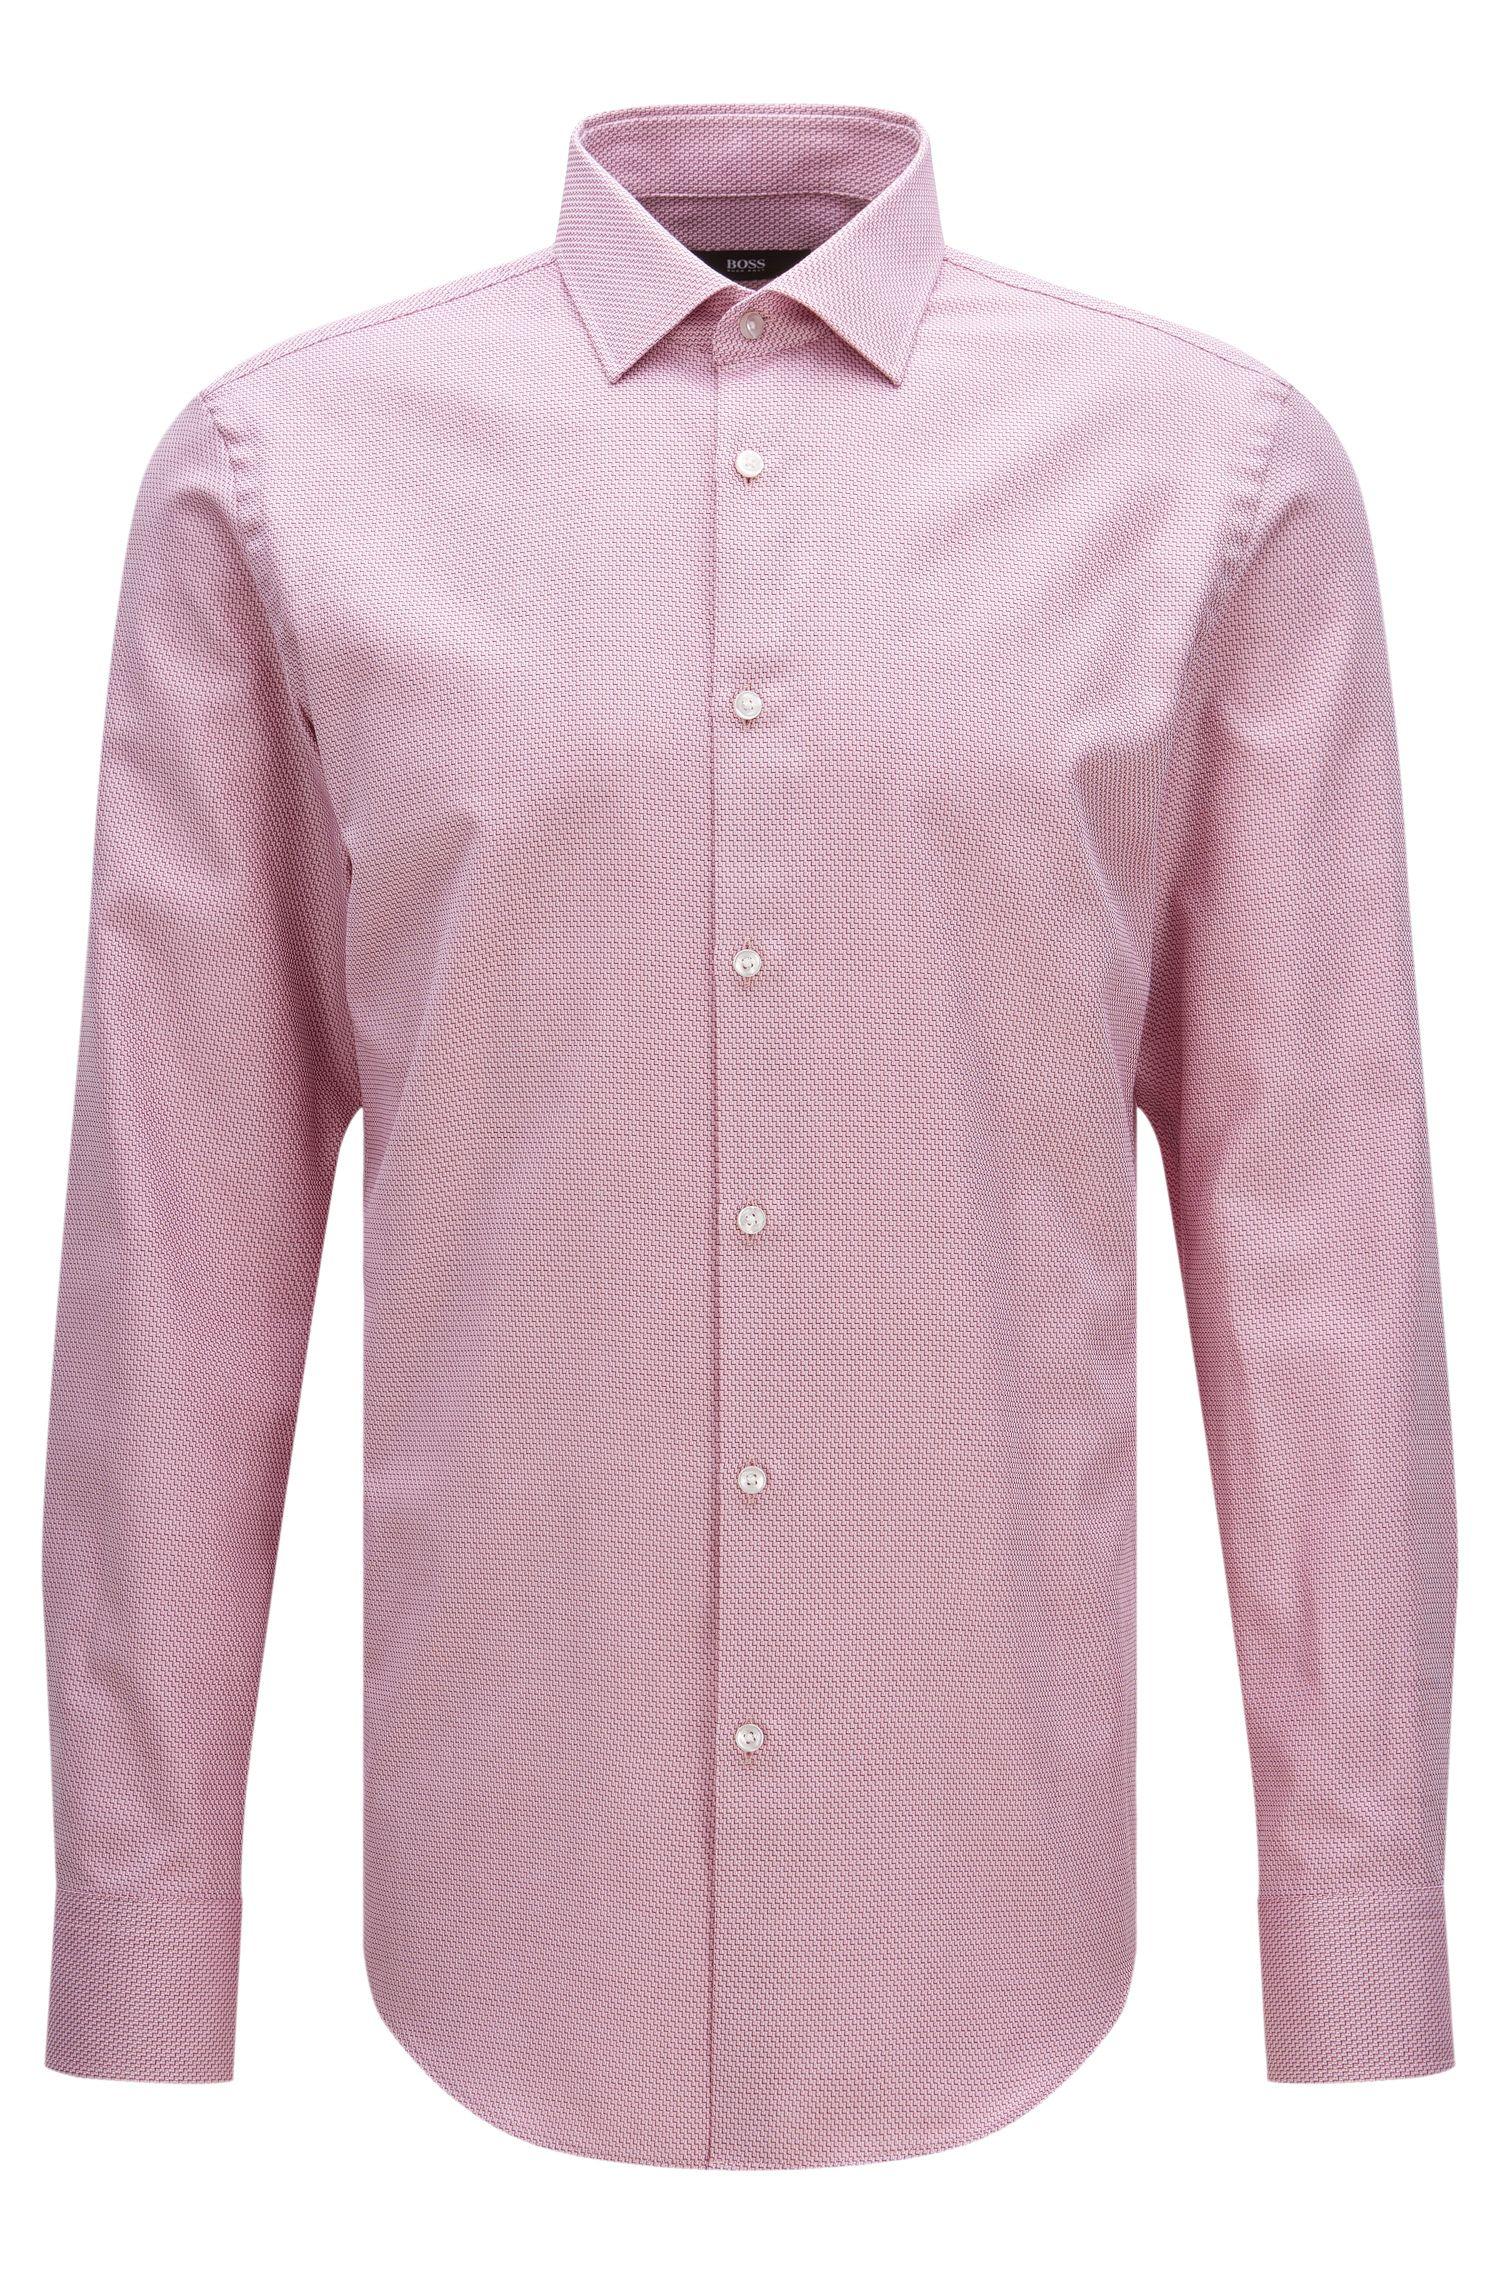 Fein gemustertes Slim-Fit Hemd aus Baumwolle: 'Jenno'